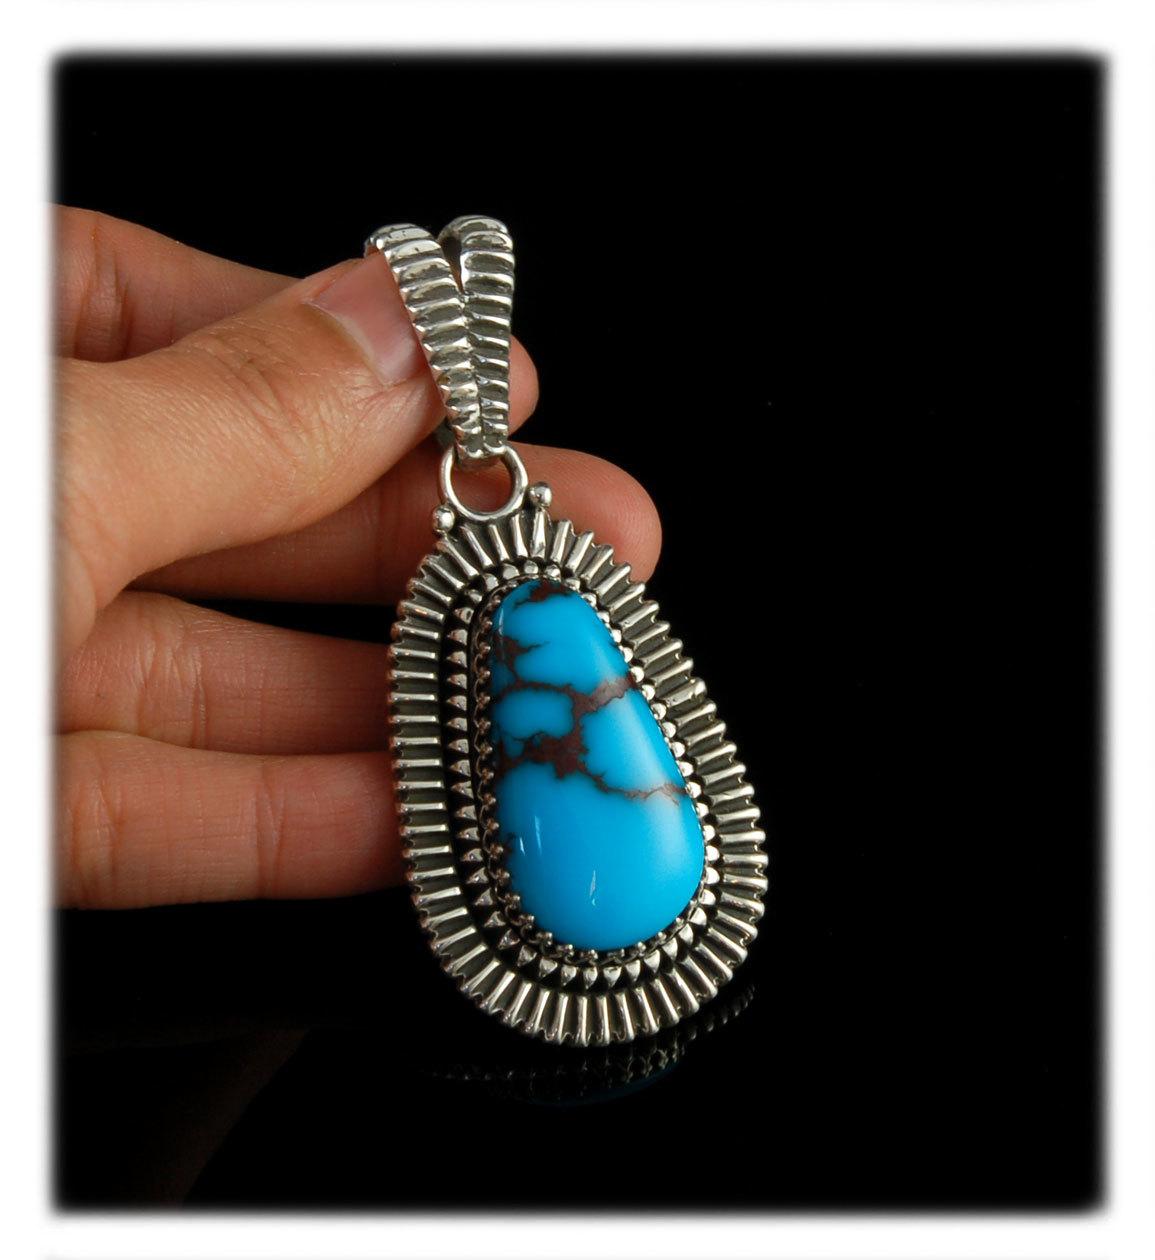 Egyptian Turquoise Pendant by John Hartman